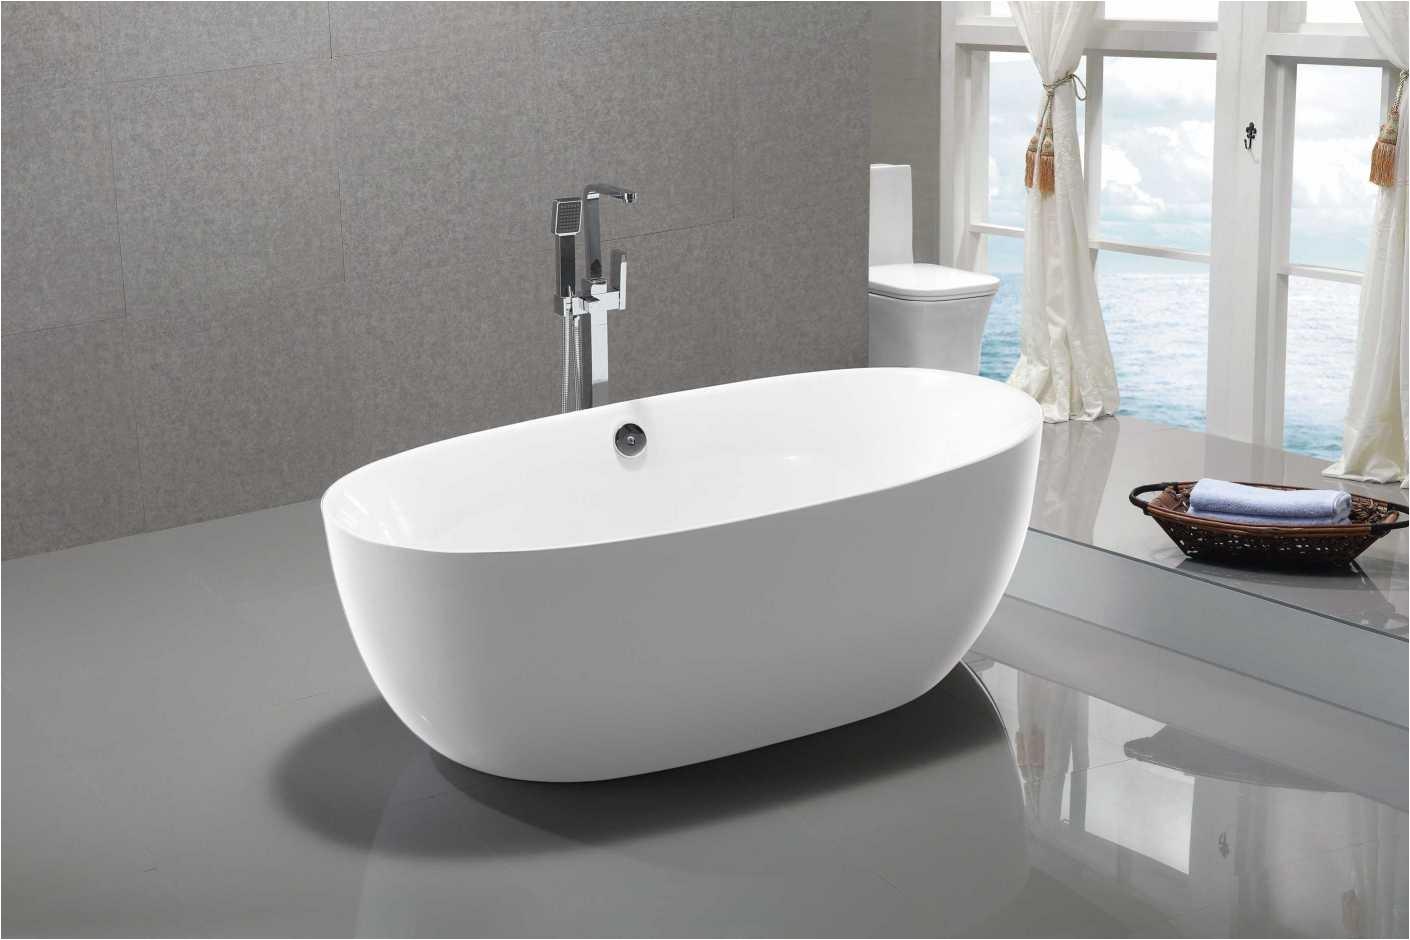 bellavista freestandingbath bathroom bath bathroondesign bathroomdecor bathroominspiration freestanding